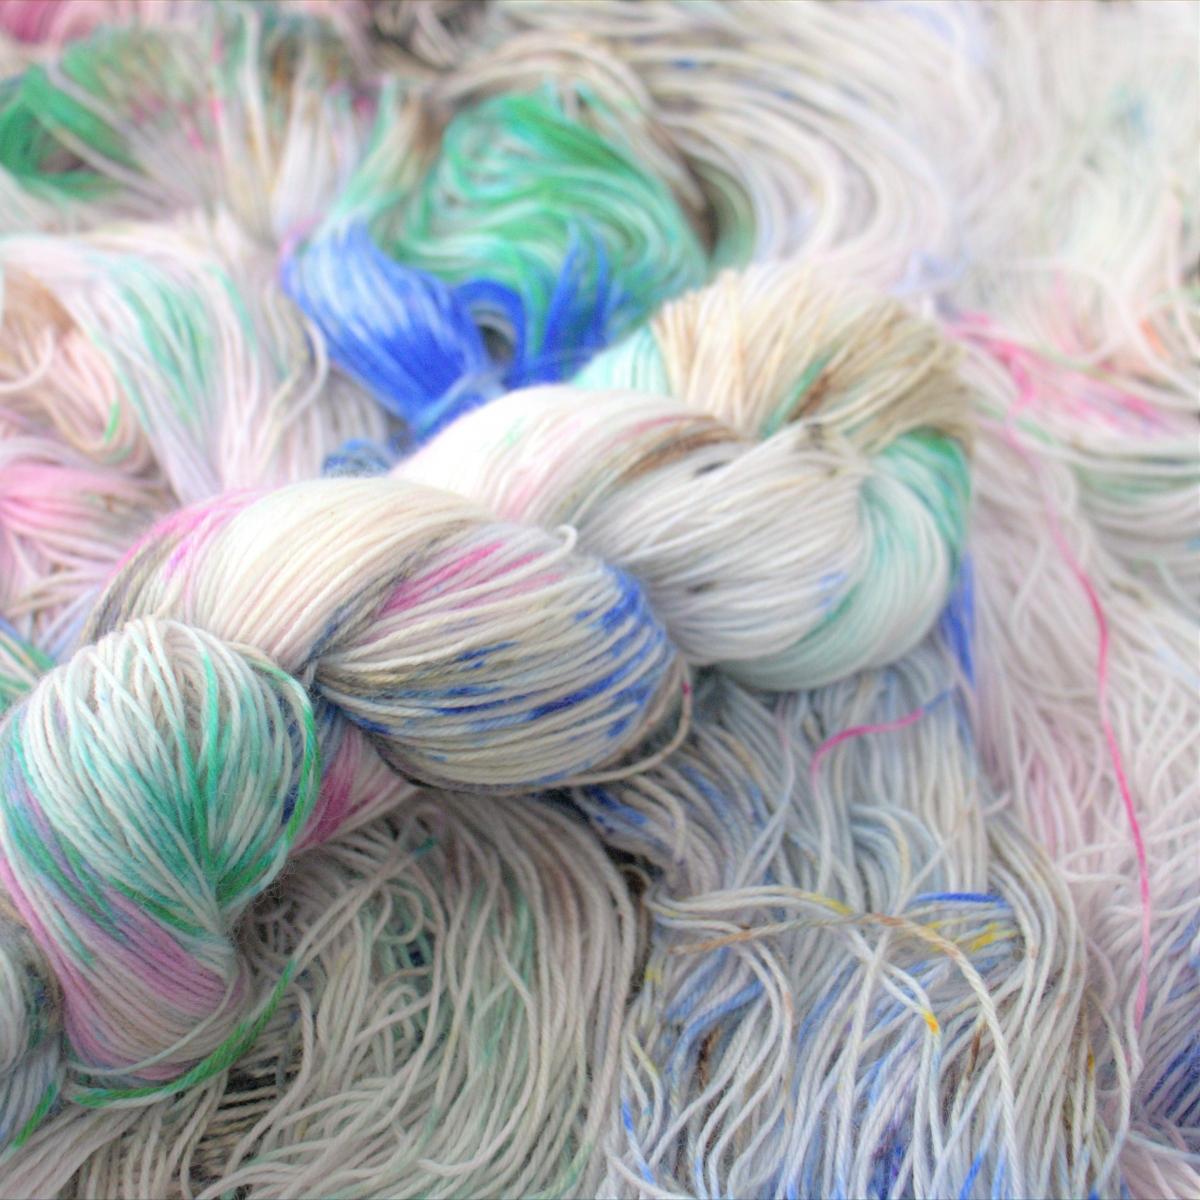 woodico.pro hand dyed yarn 048 4 1200x1200 - Hand dyed yarn / 048